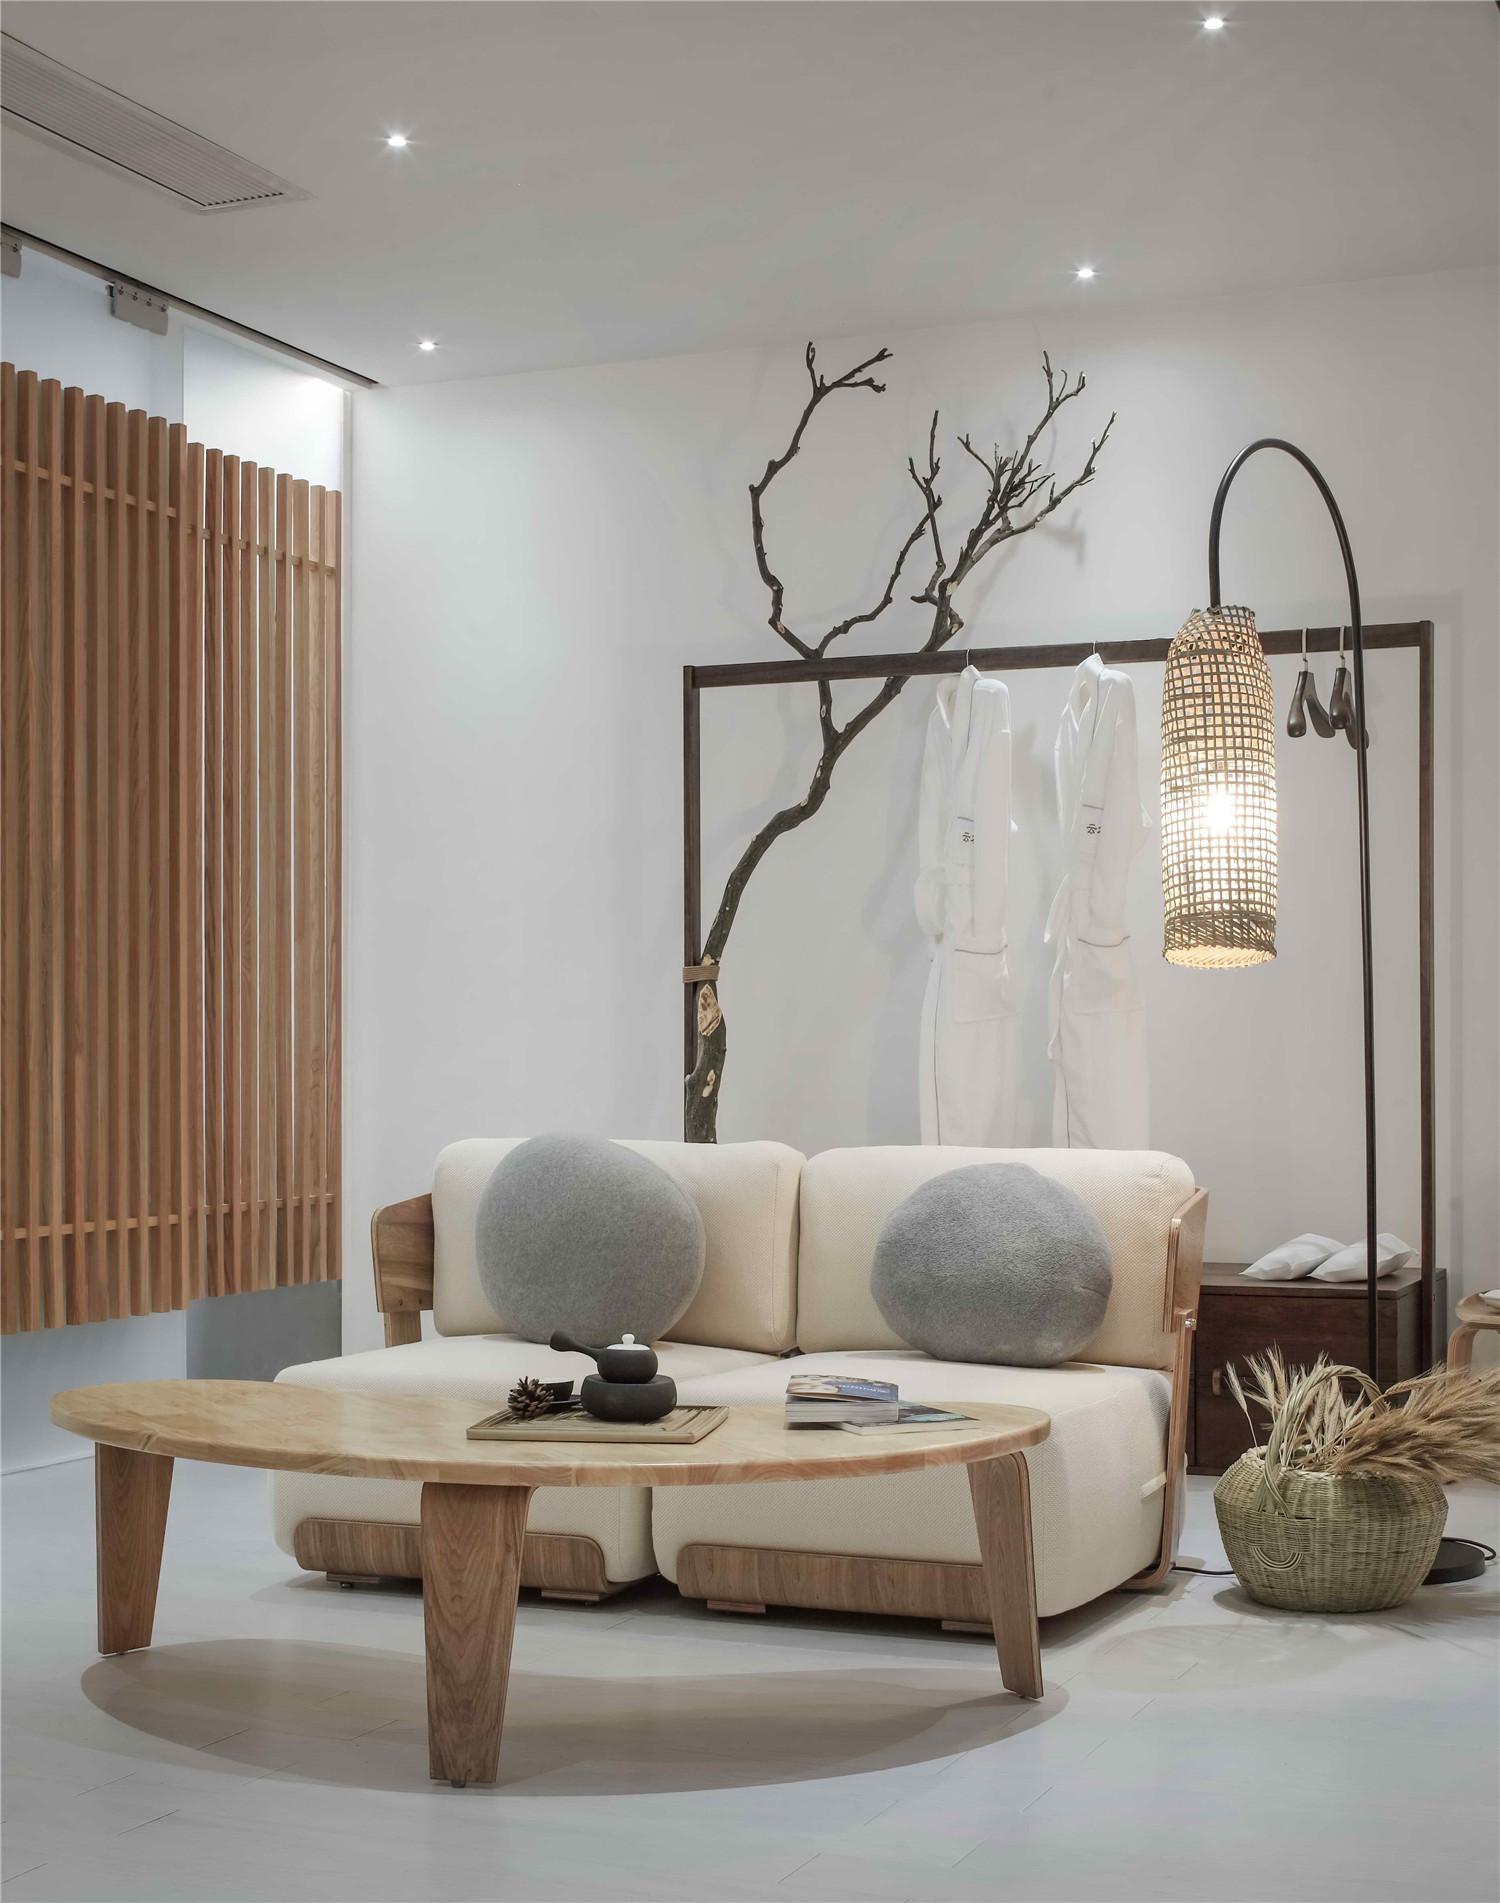 Ripple Hotel - Qiandao Lake design brief Hisheji (70)